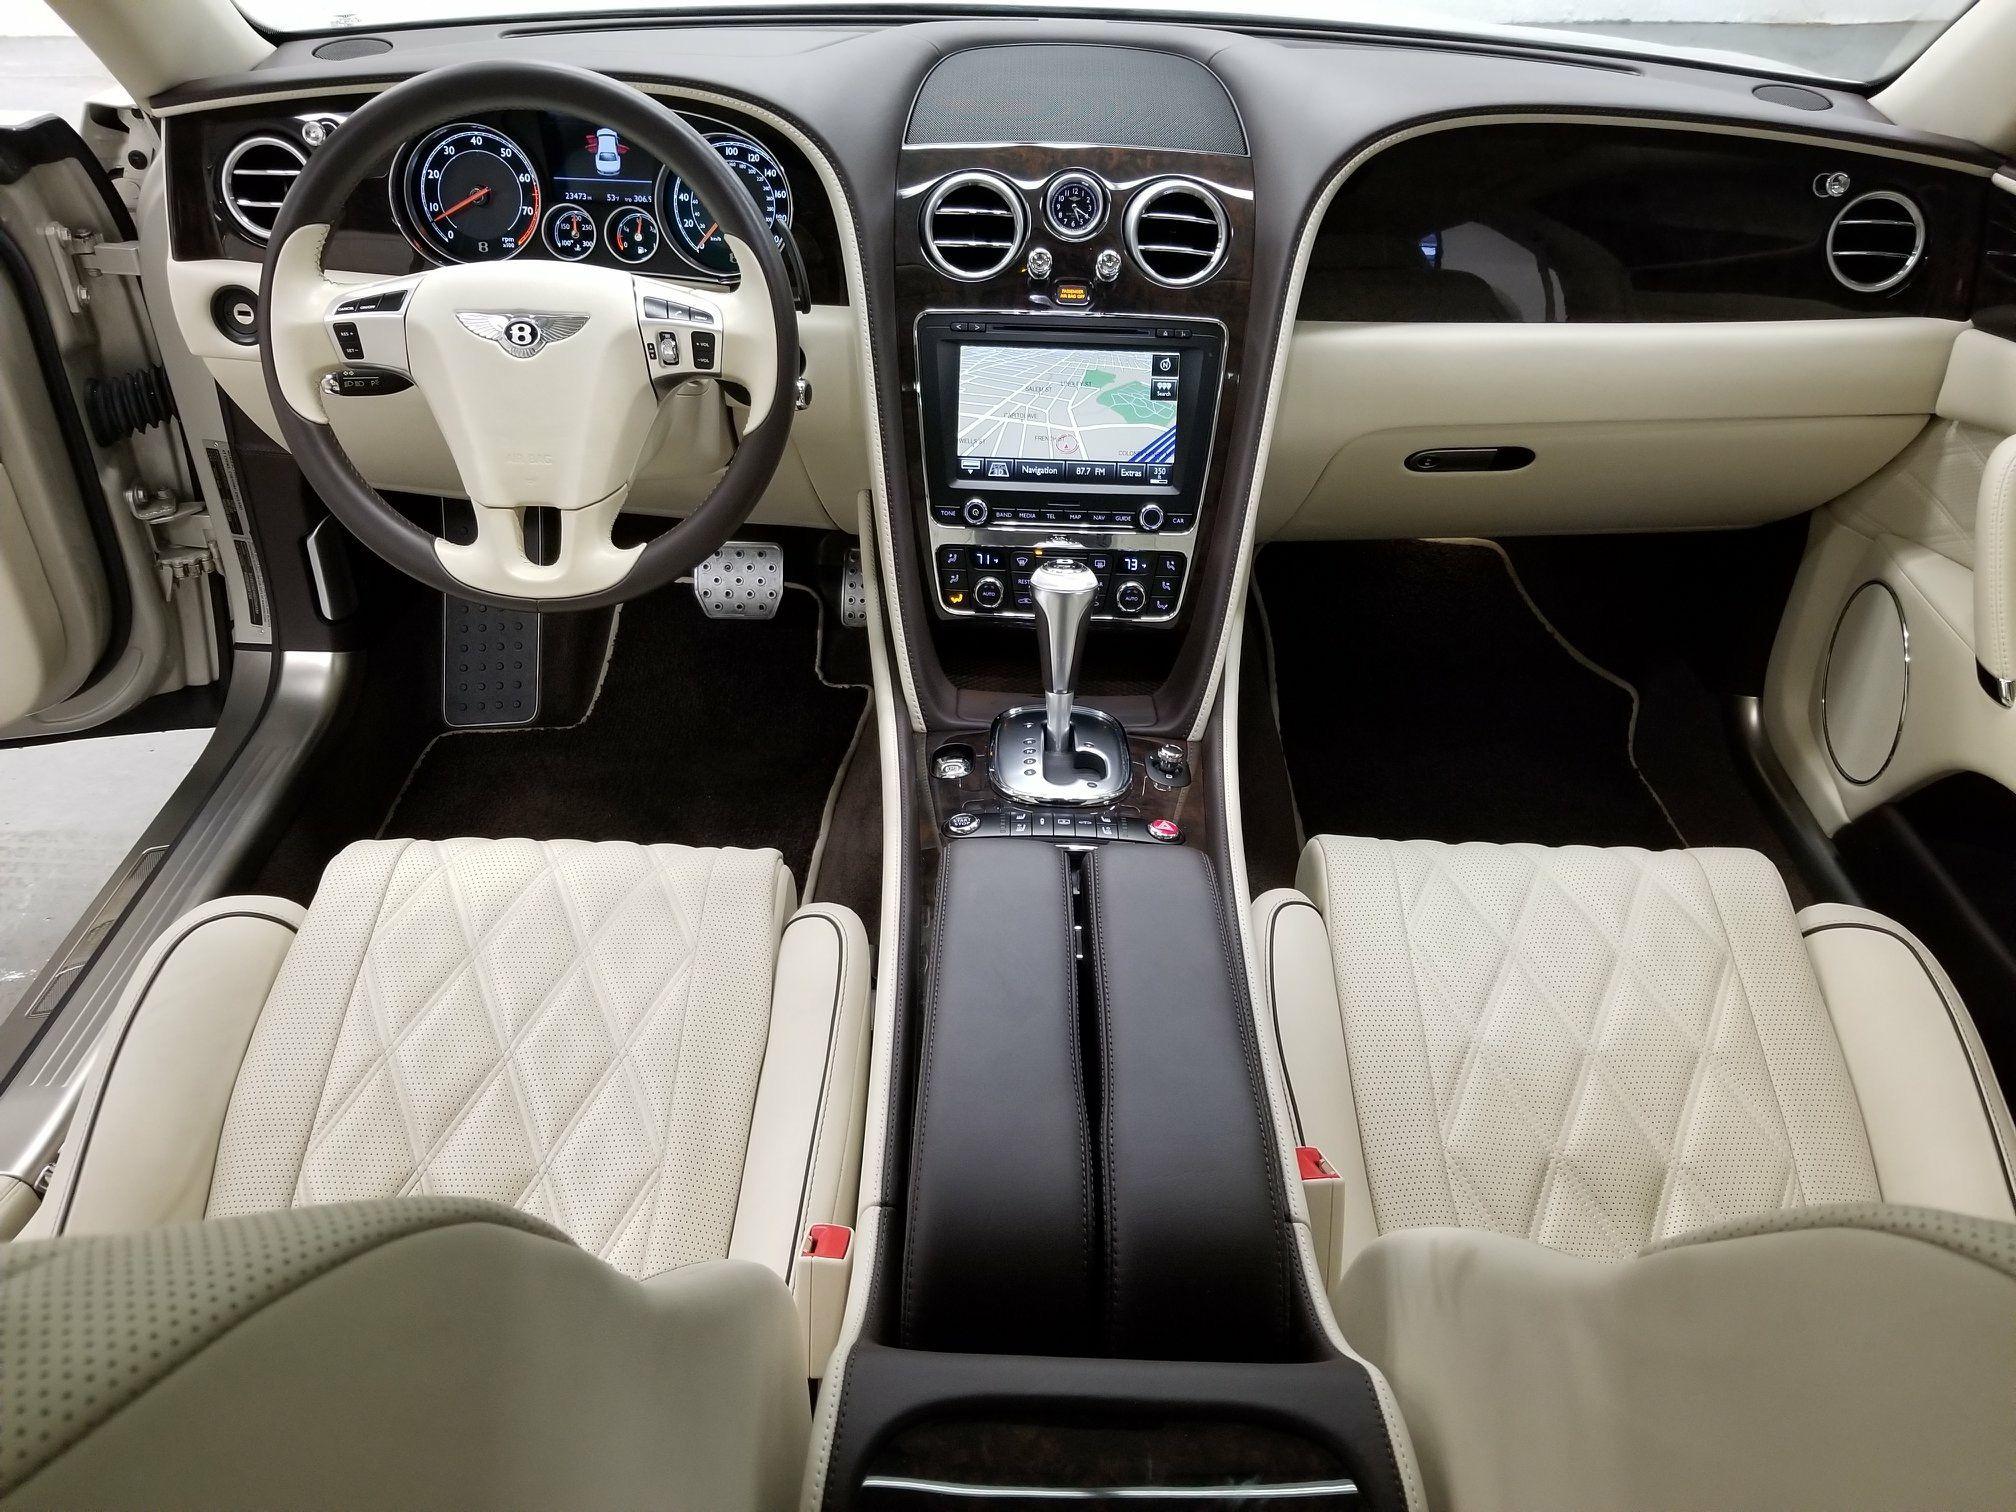 Bentley Interior Bentley Interior Bentley Car Seats